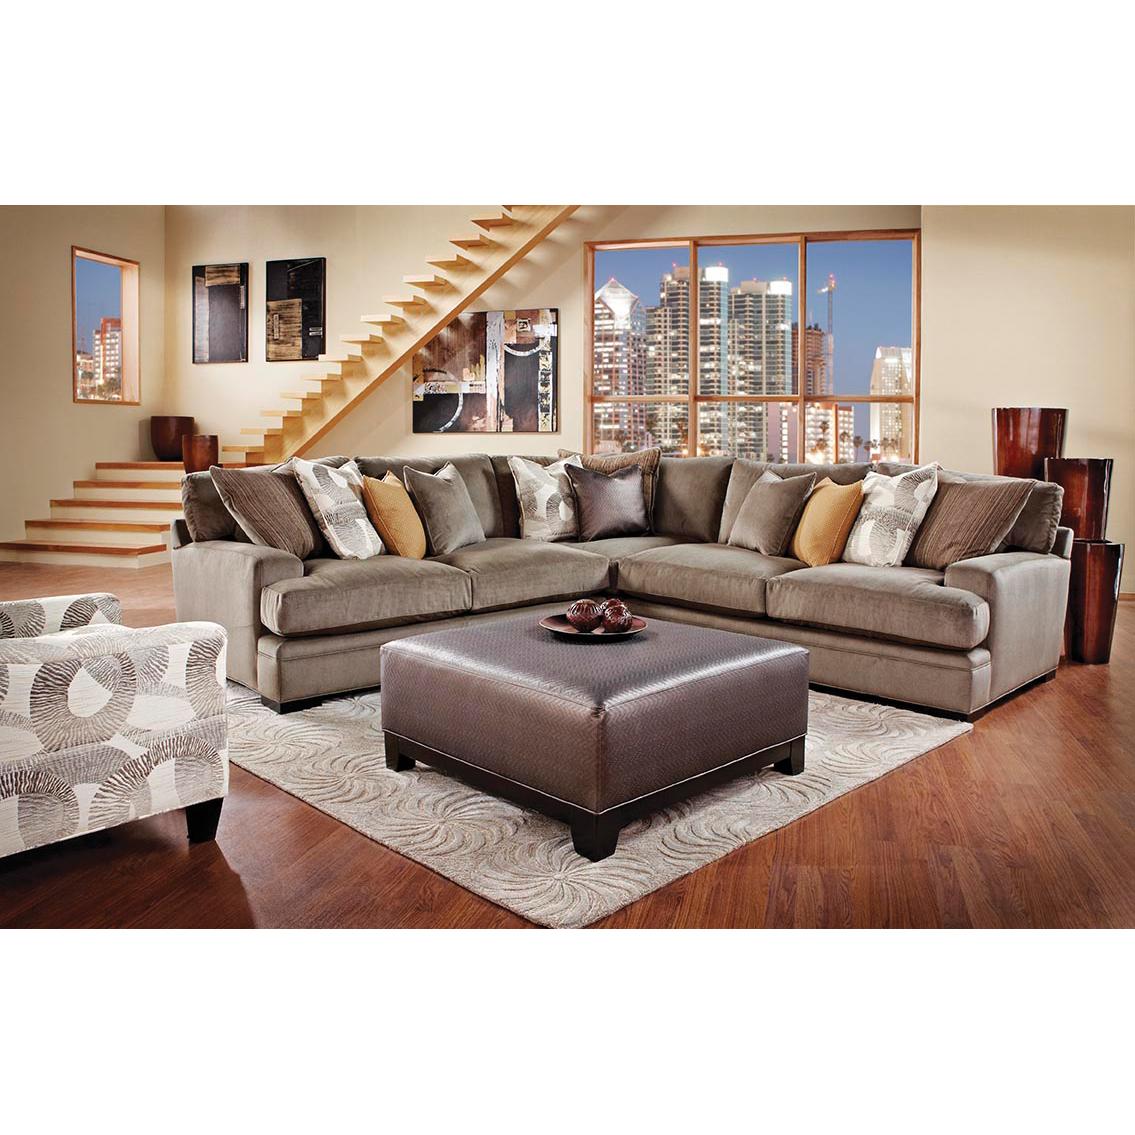 Willey Furniture Las Vegas: RC Willey In Las Vegas, NV